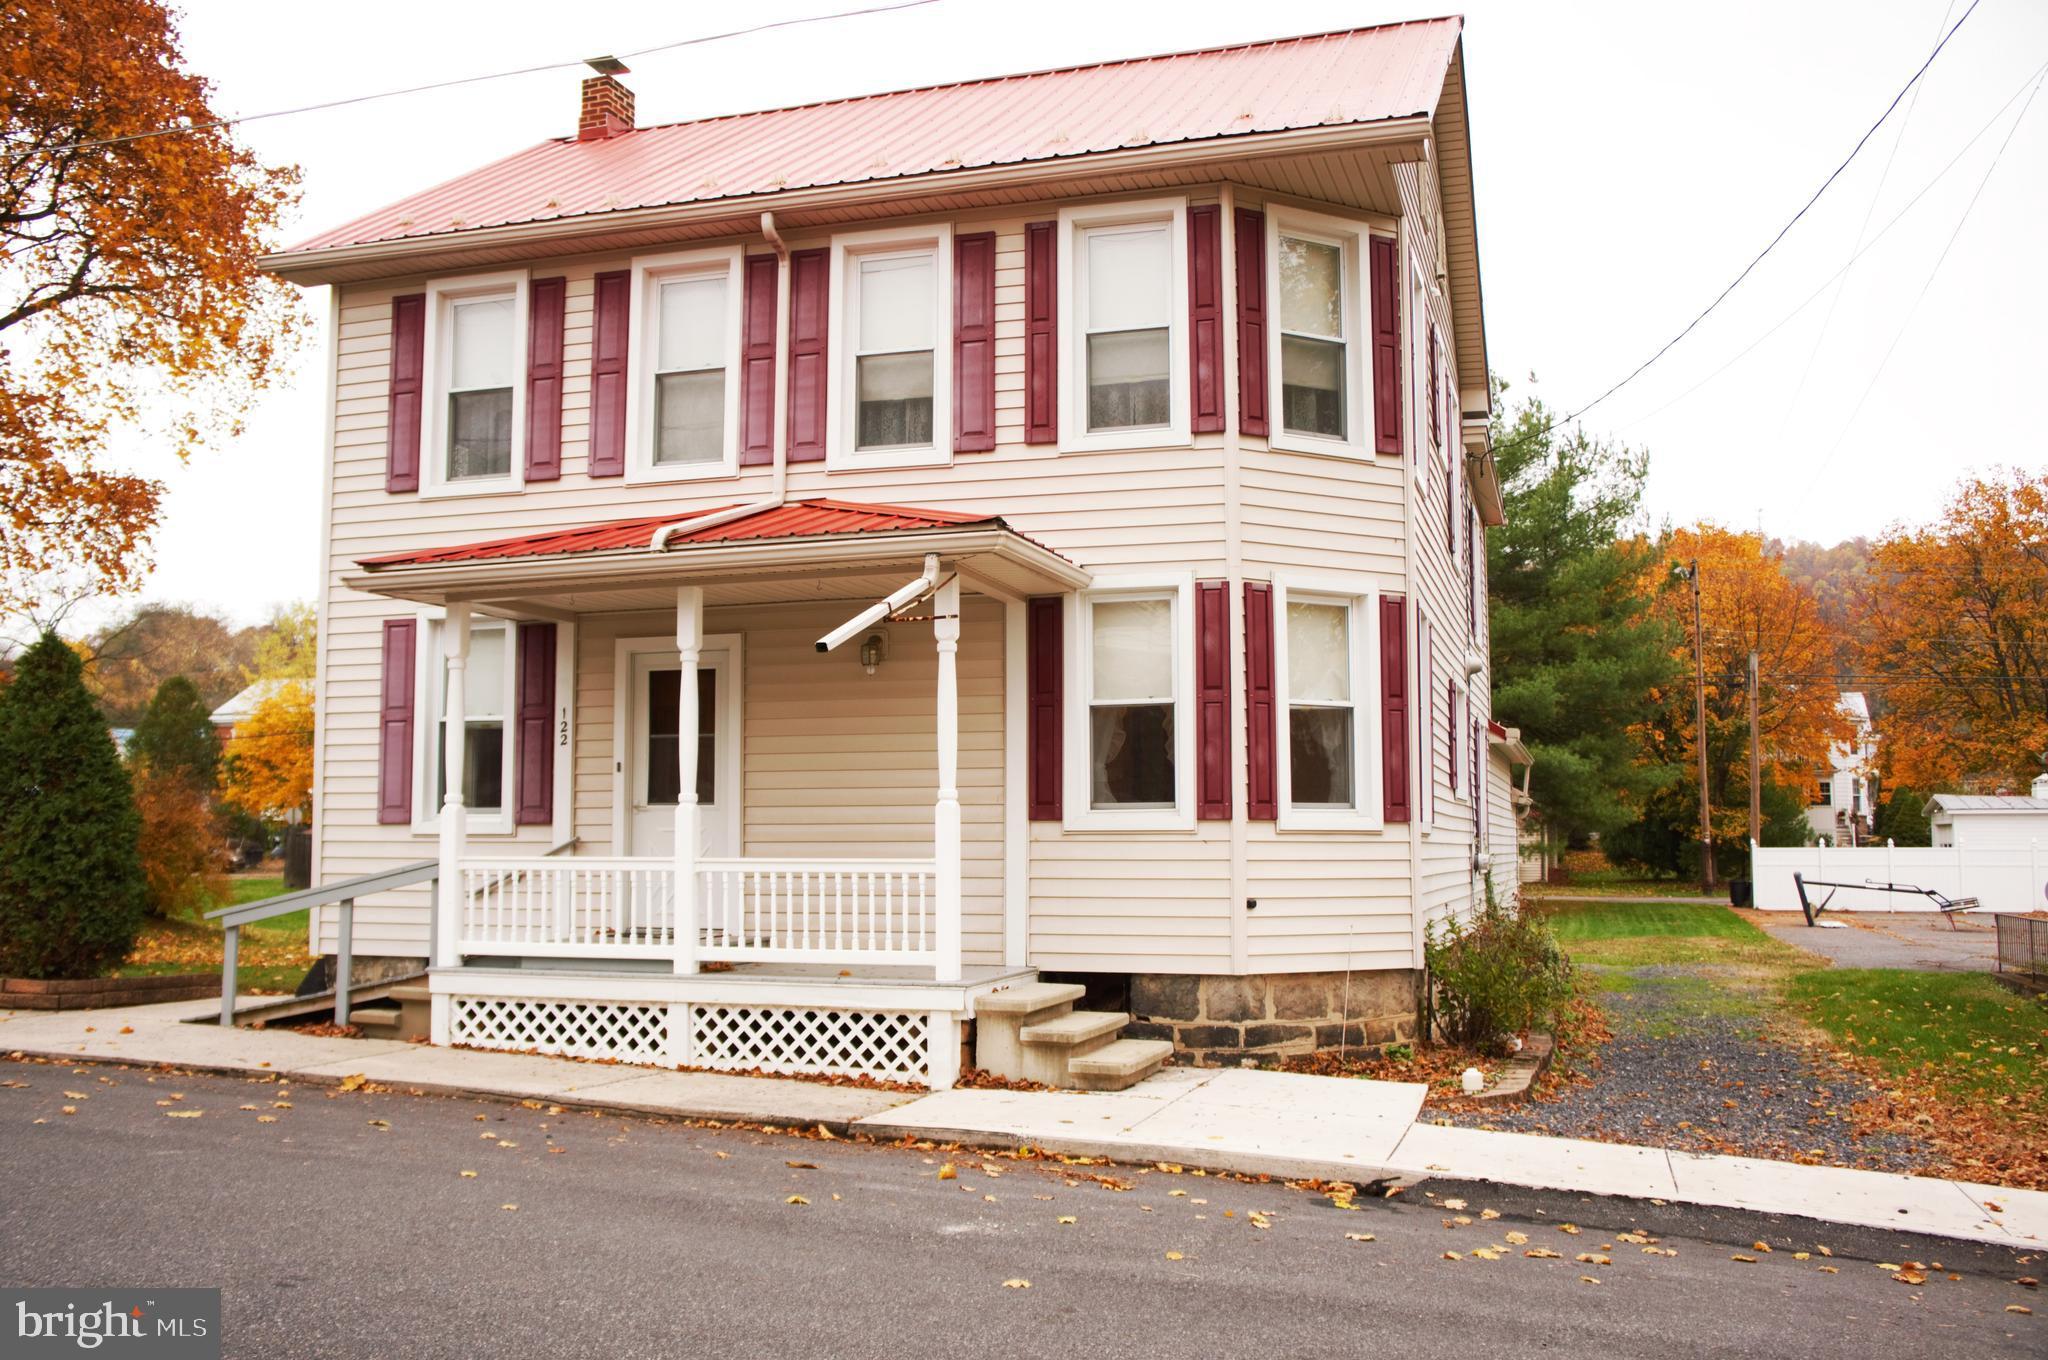 122 W MCCLURE STREET, NEW BLOOMFIELD, PA 17068